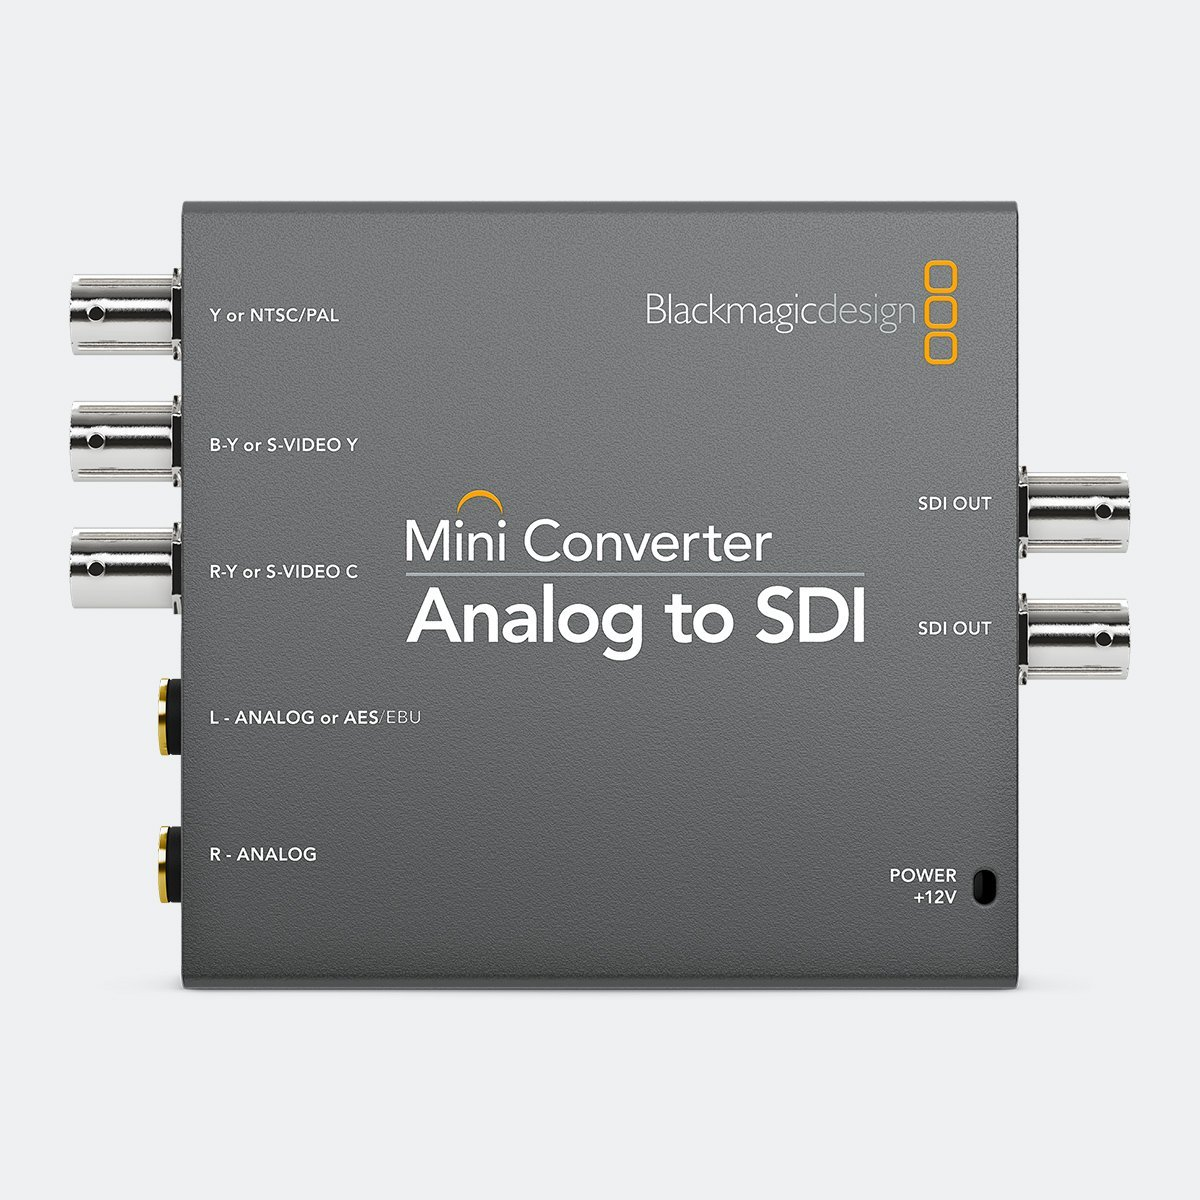 Ex-Demo Blackmagic Design Analog to SDI Mini Converter